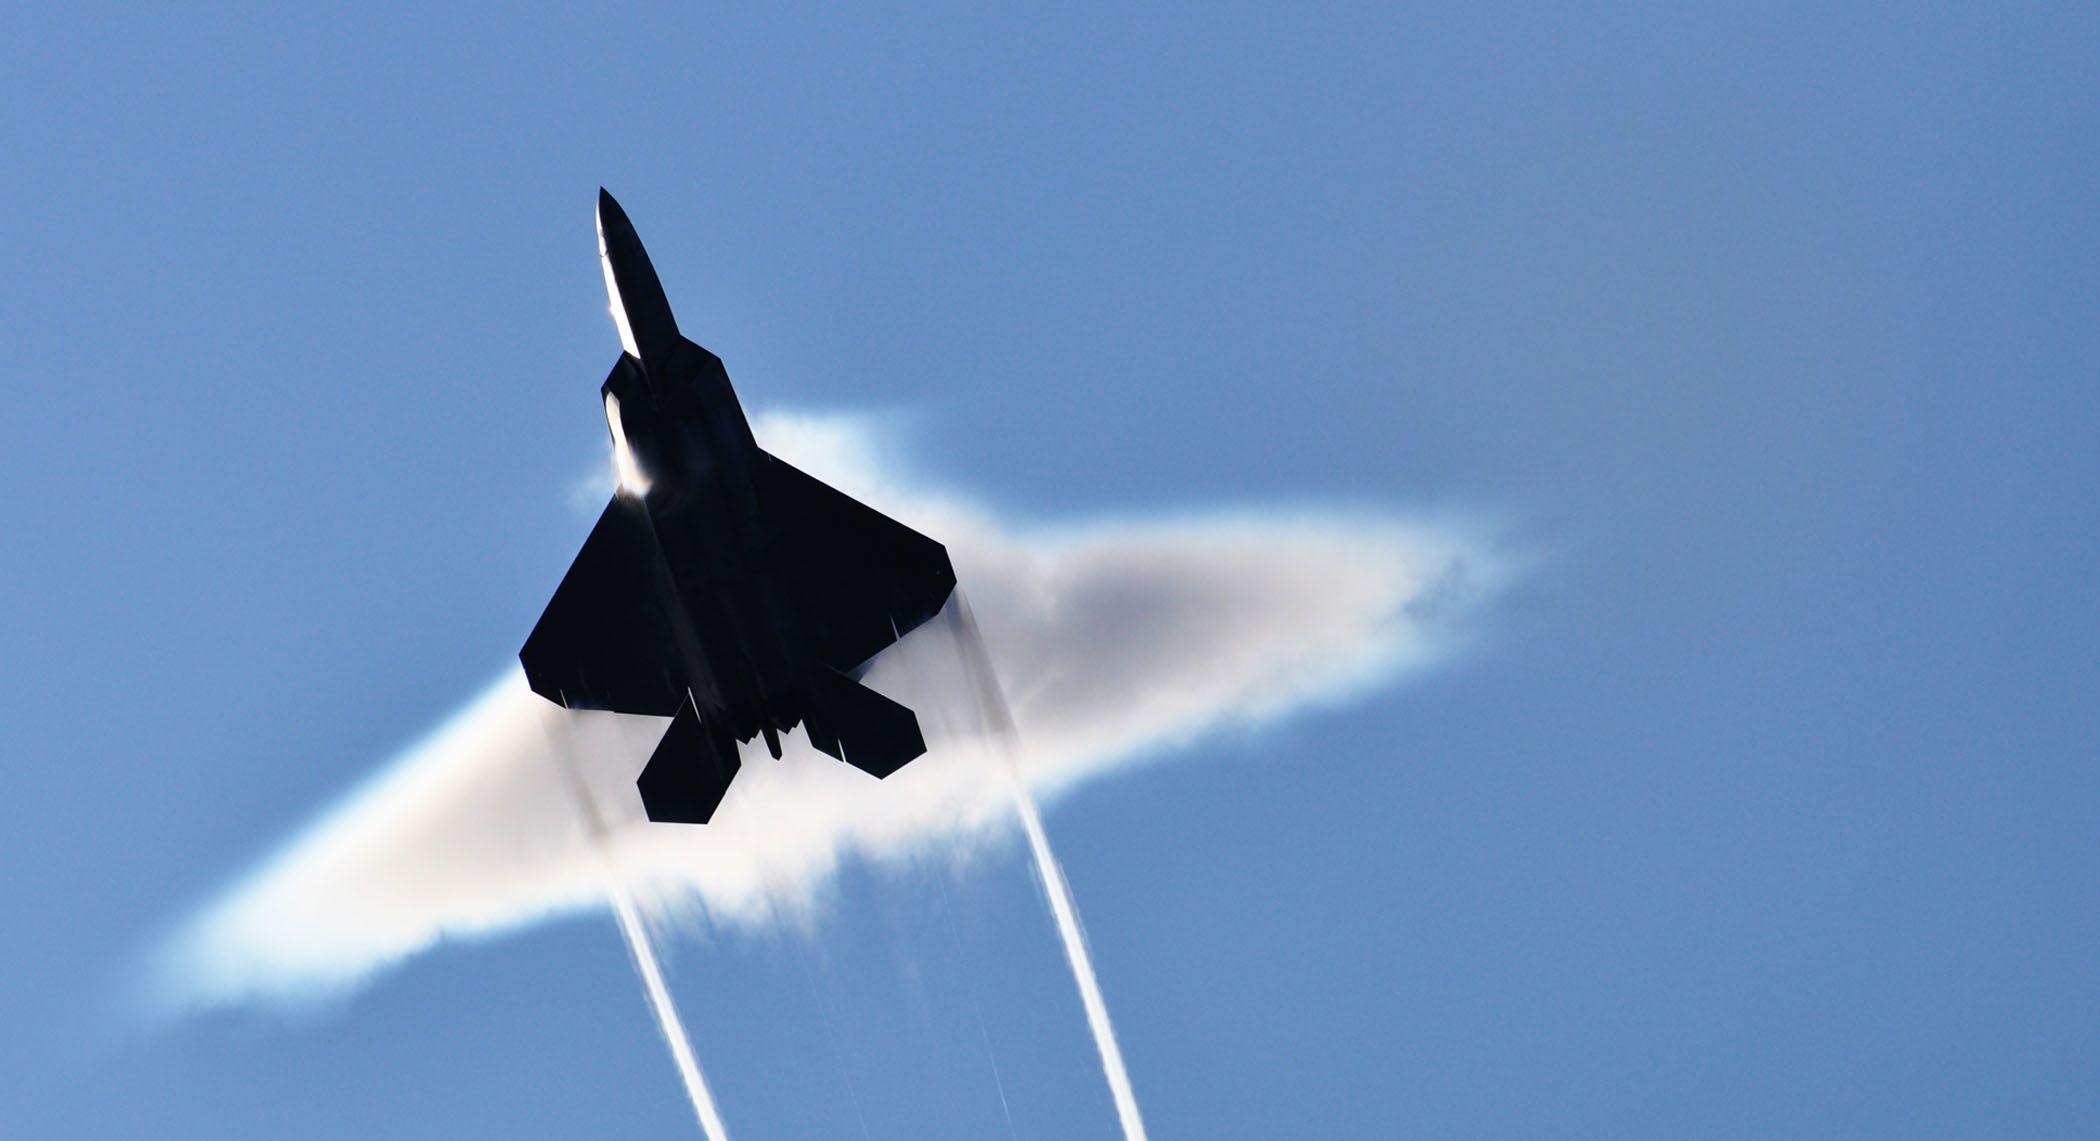 Supersonic Fighter jets, Jet, Sound barrier